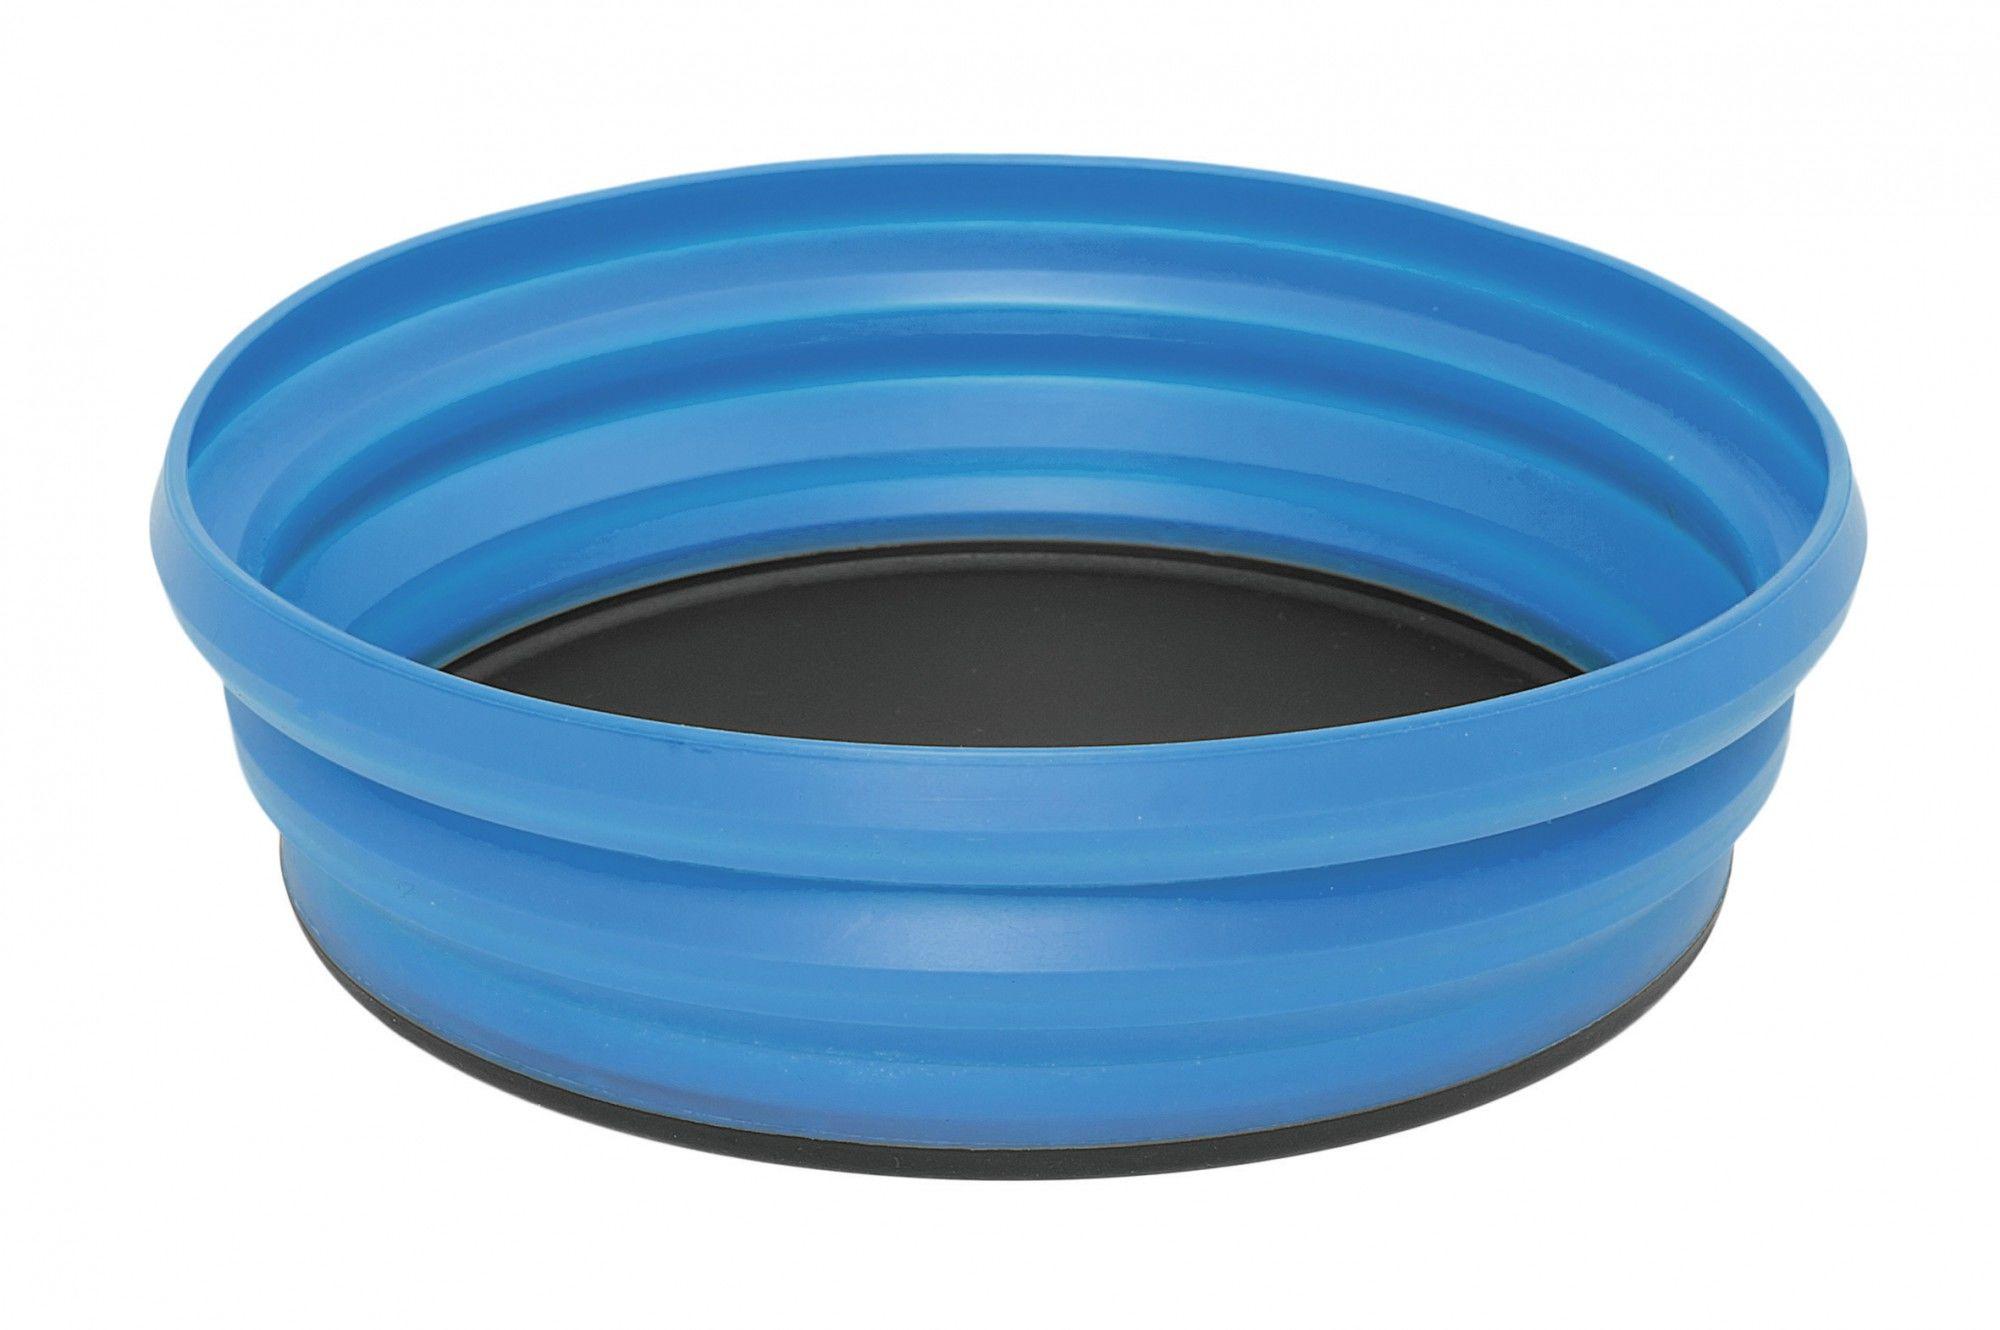 Sea to Summit X-Bowl Blau, 650 ml -Farbe Blue, 650 ml